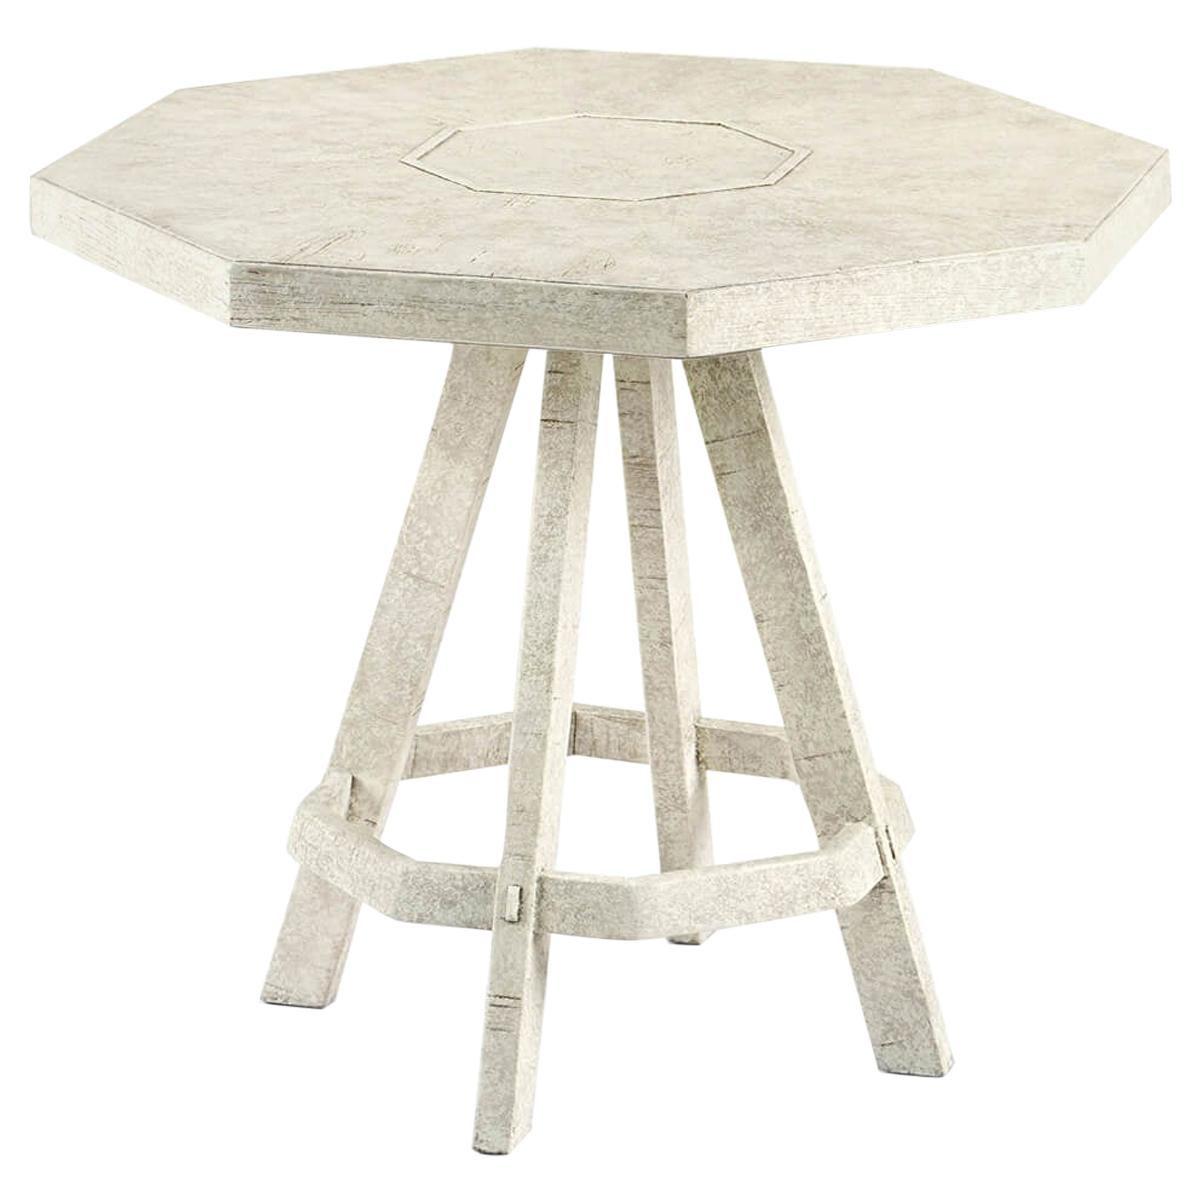 Rustic Whitewash Octagonal Side Table